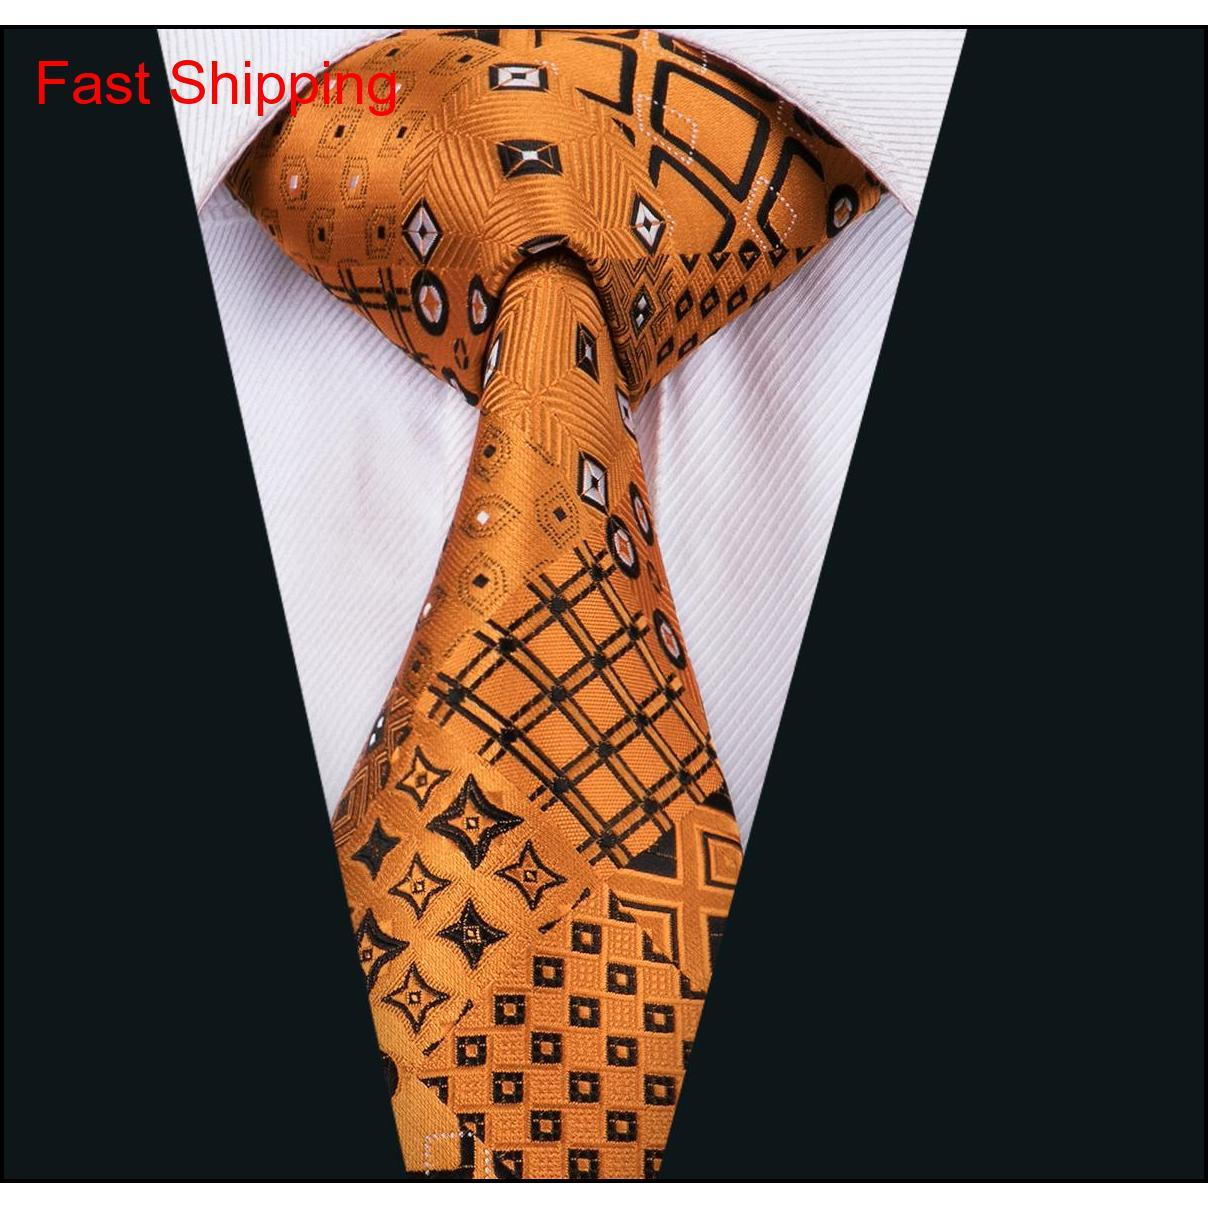 fashion men tie classci silk mens neck ties gold tie sets tie hanky cufflinks sets jacquard woven meeting business wedding party gift